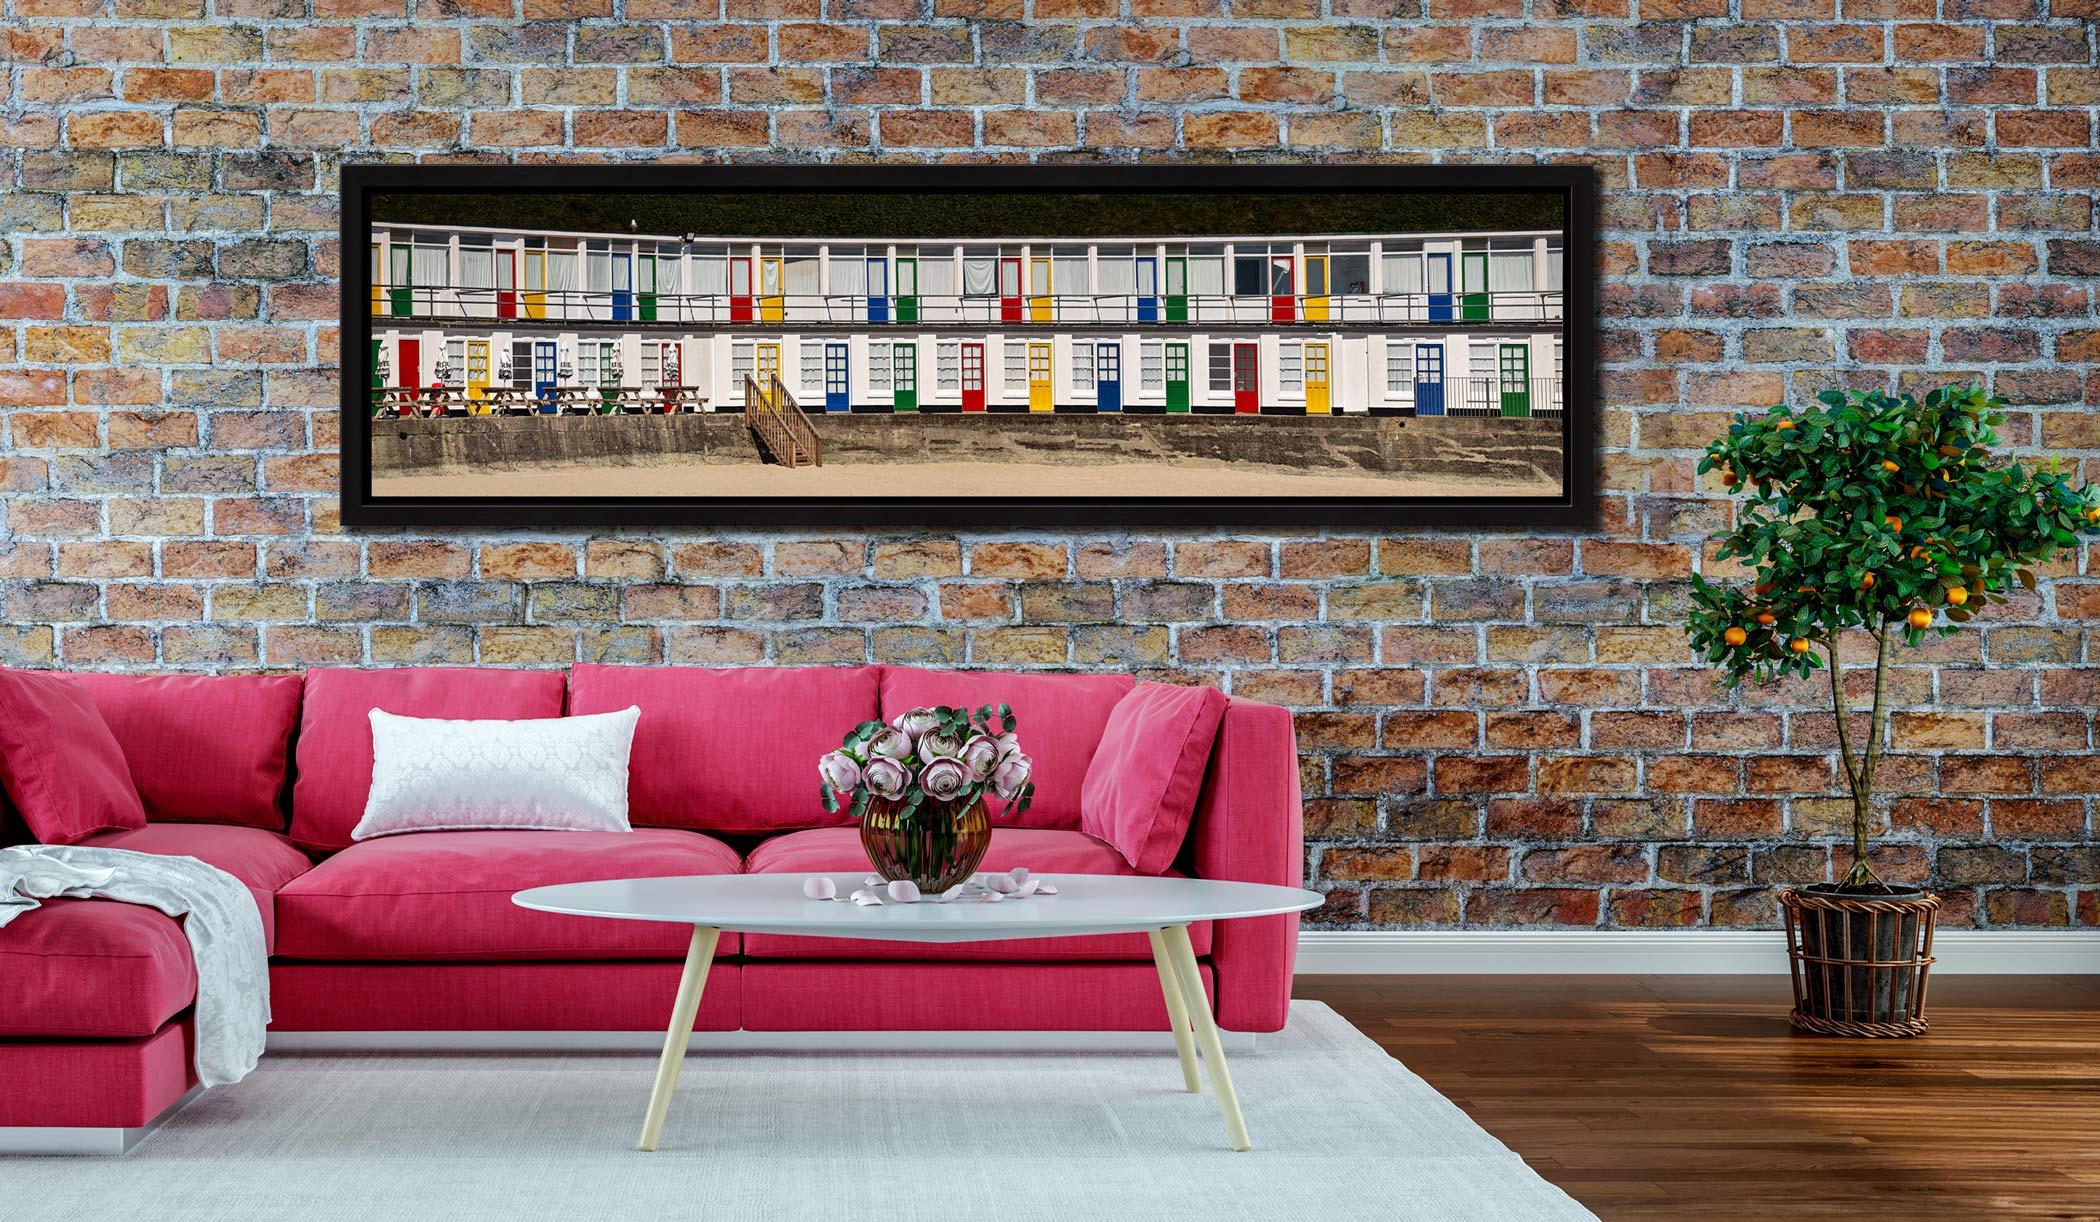 Porthgwidden Beach Chalets - Black oak floater frame with acrylic glazing on Wall